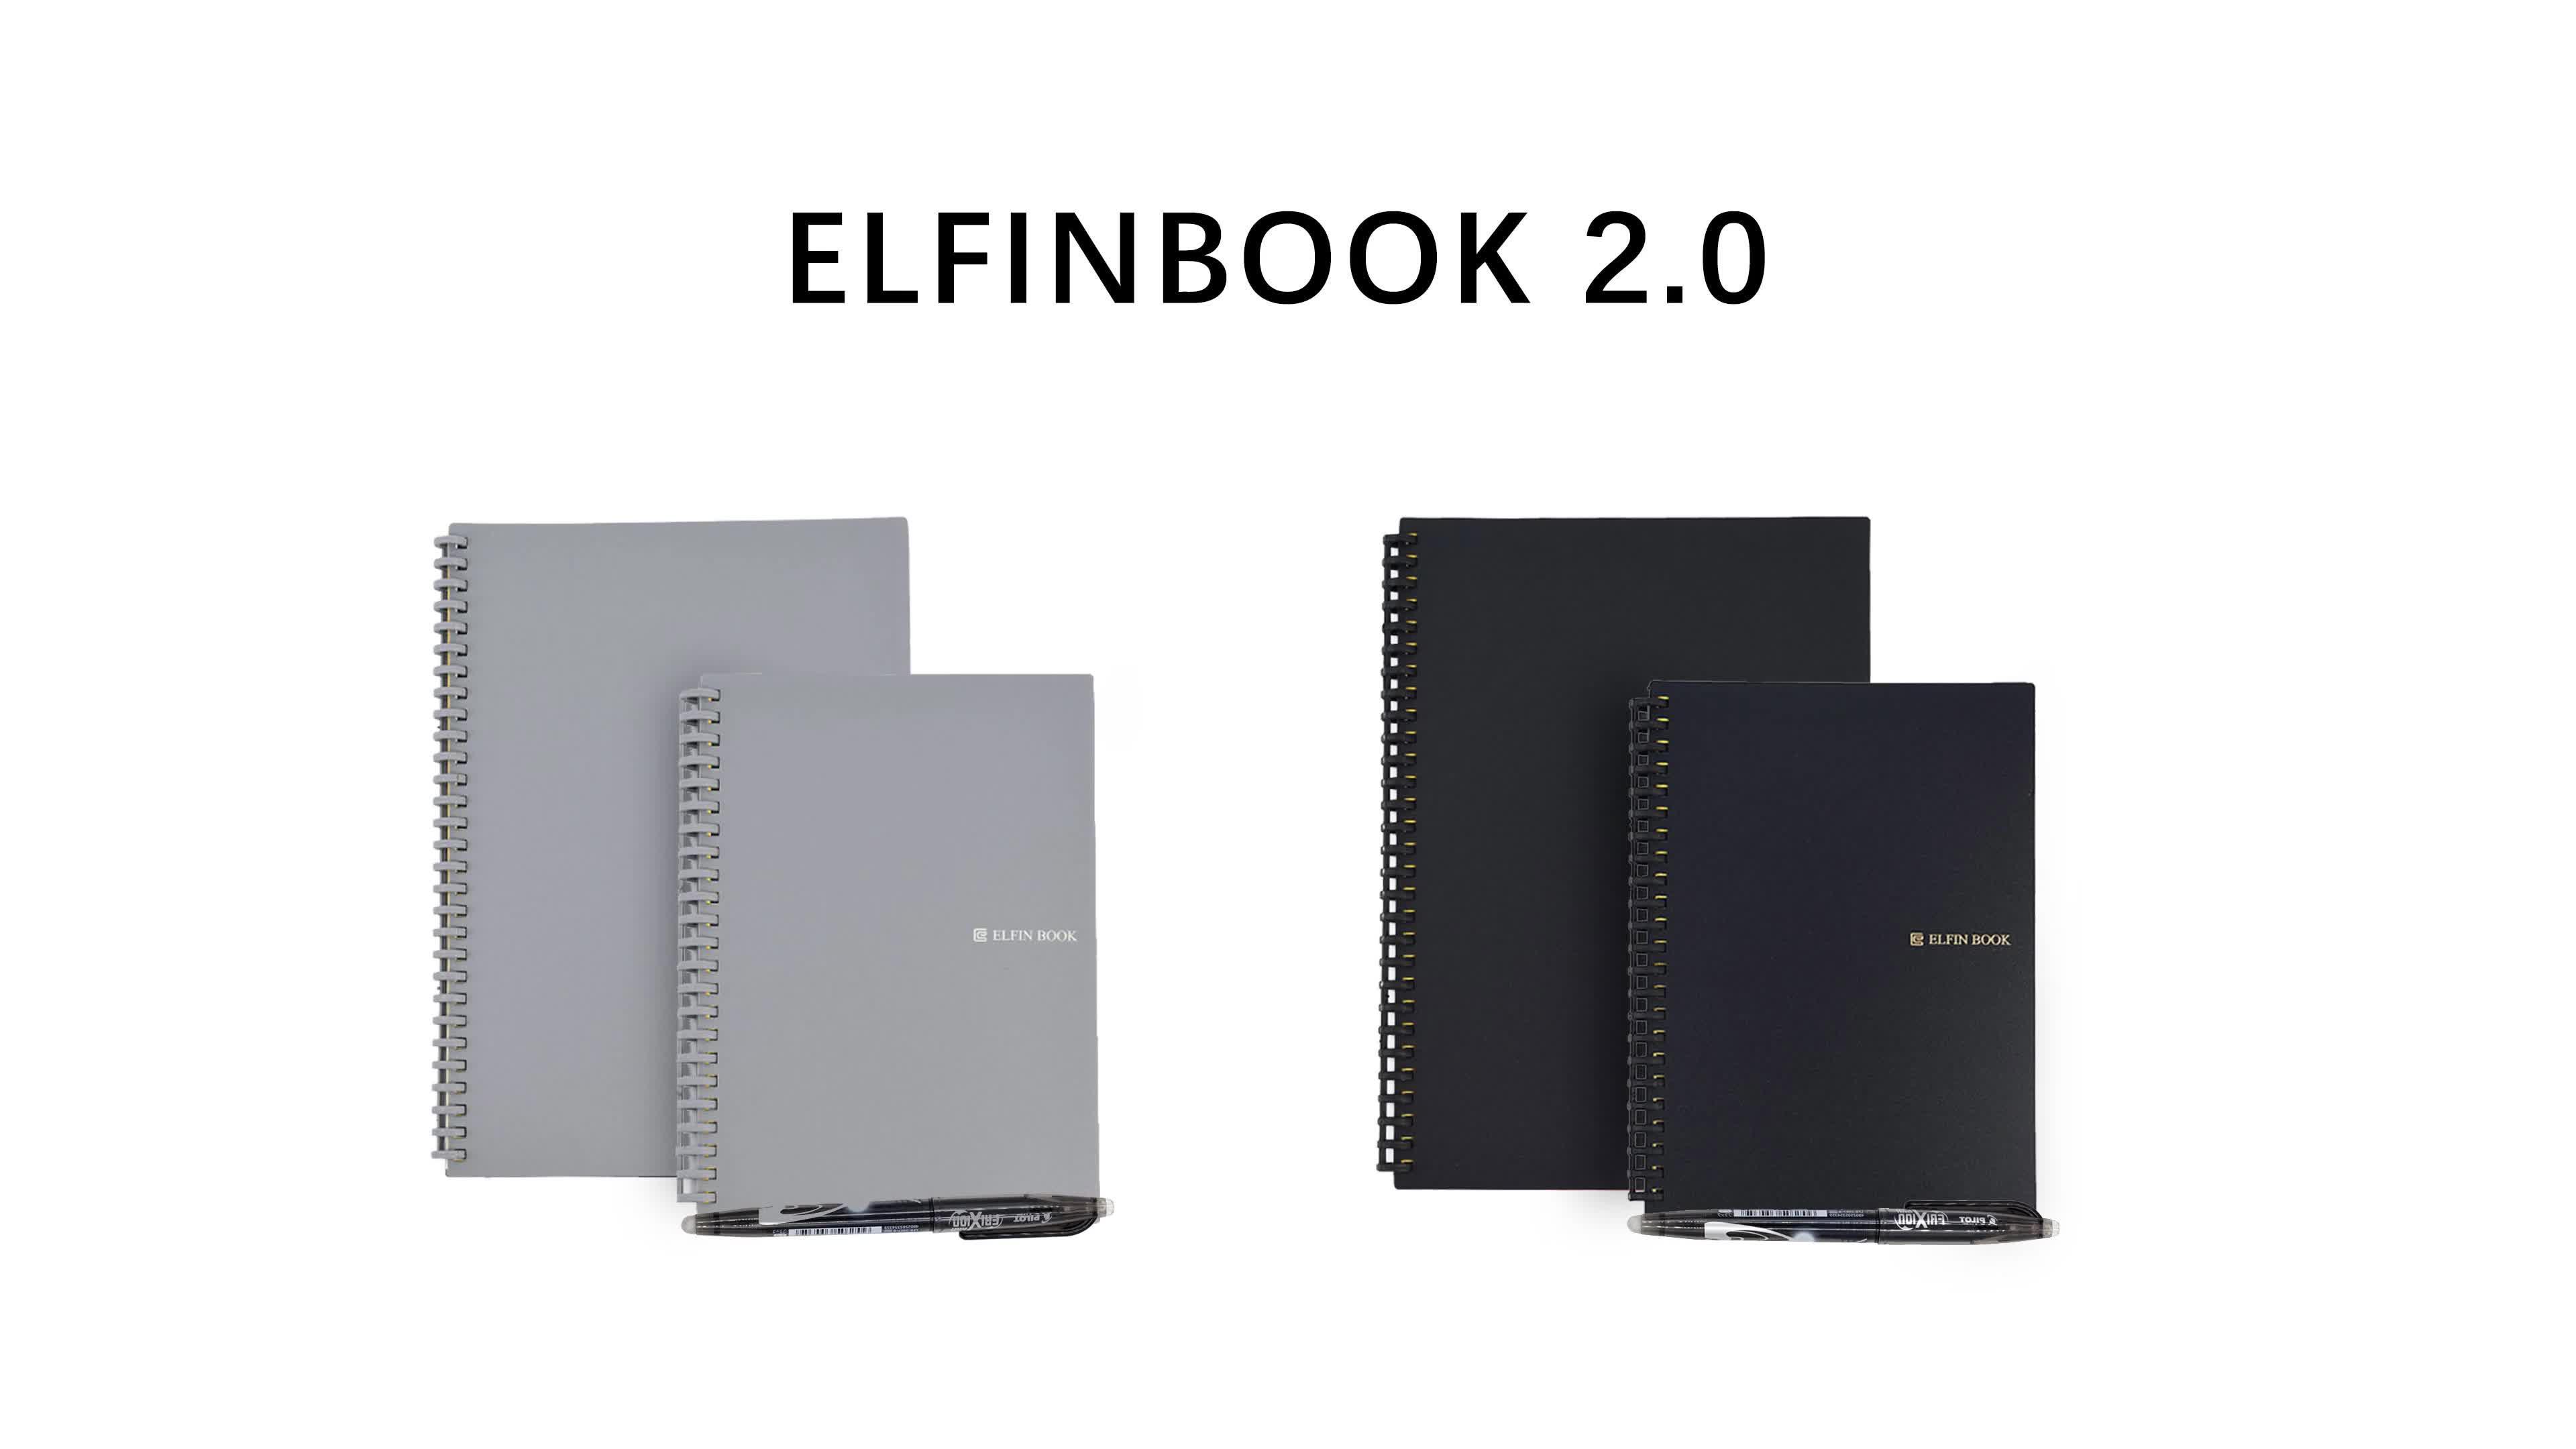 Elfinbook 2.0 재사용할만한 재활용 스마트 노트북 Suvenirs 프로모션 독특한 선물 프로모션 로고